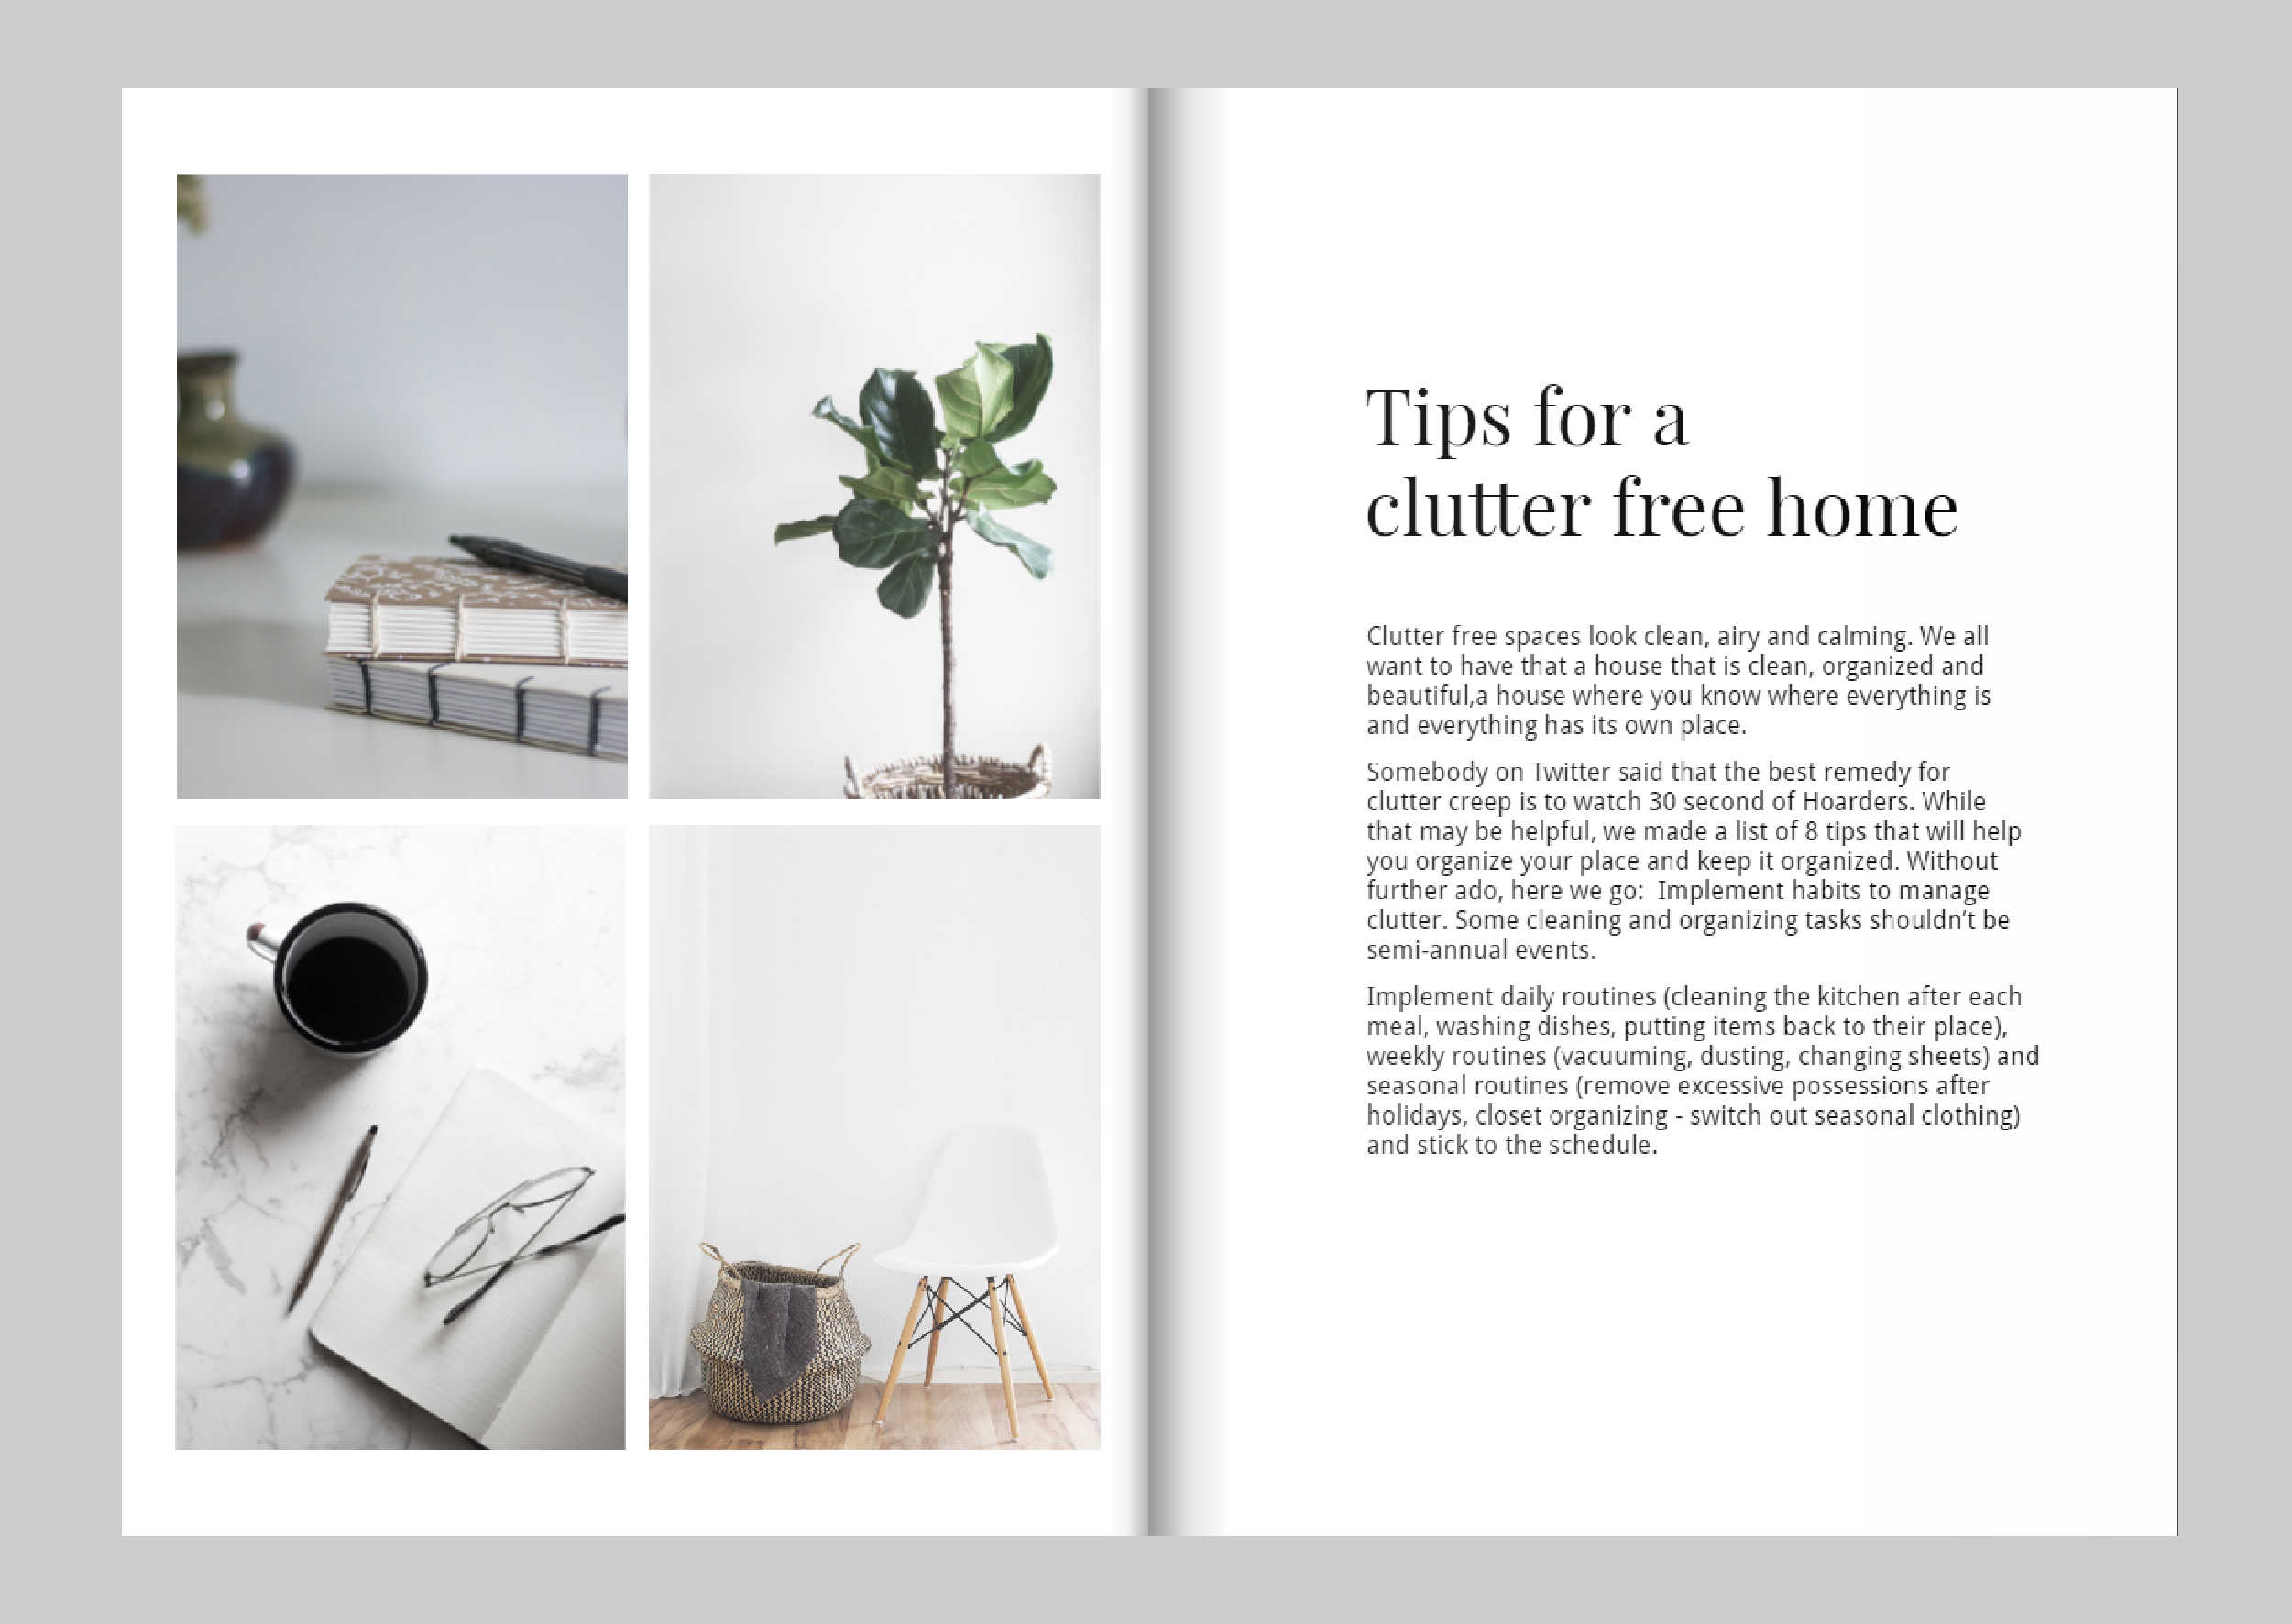 Design A Magazine Like Kinfolk Free Template Edit Online Magazine Layout Magazine Layout Inspiration Page Layout Design